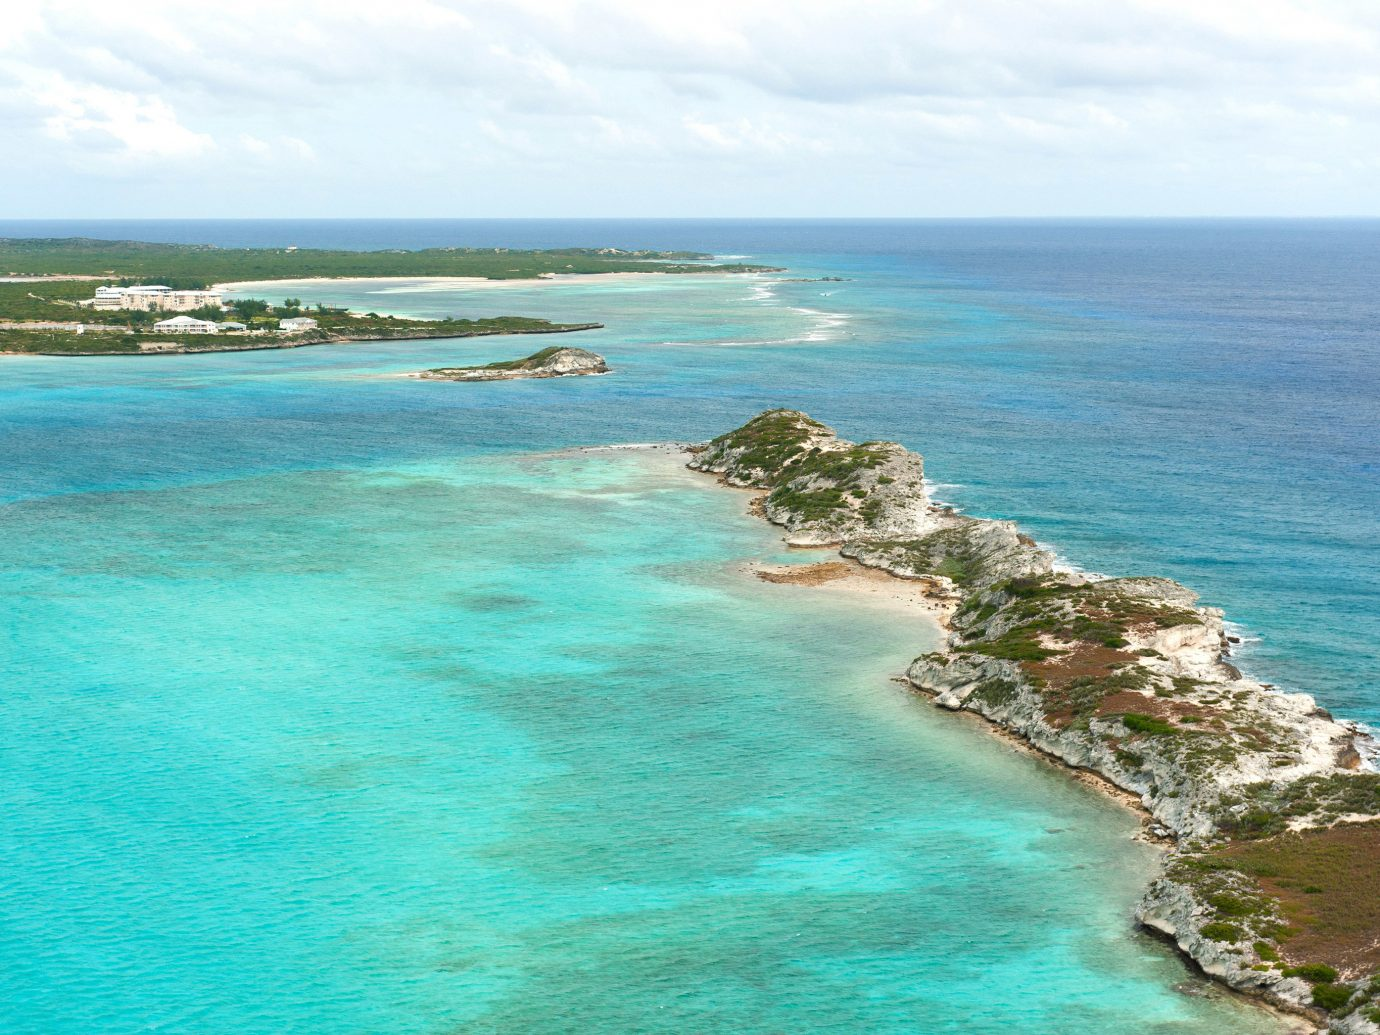 water sky Nature Ocean Sea Coast shore promontory Beach islet caribbean wind wave cape cliff cove terrain archipelago Island Lagoon blue wave reef